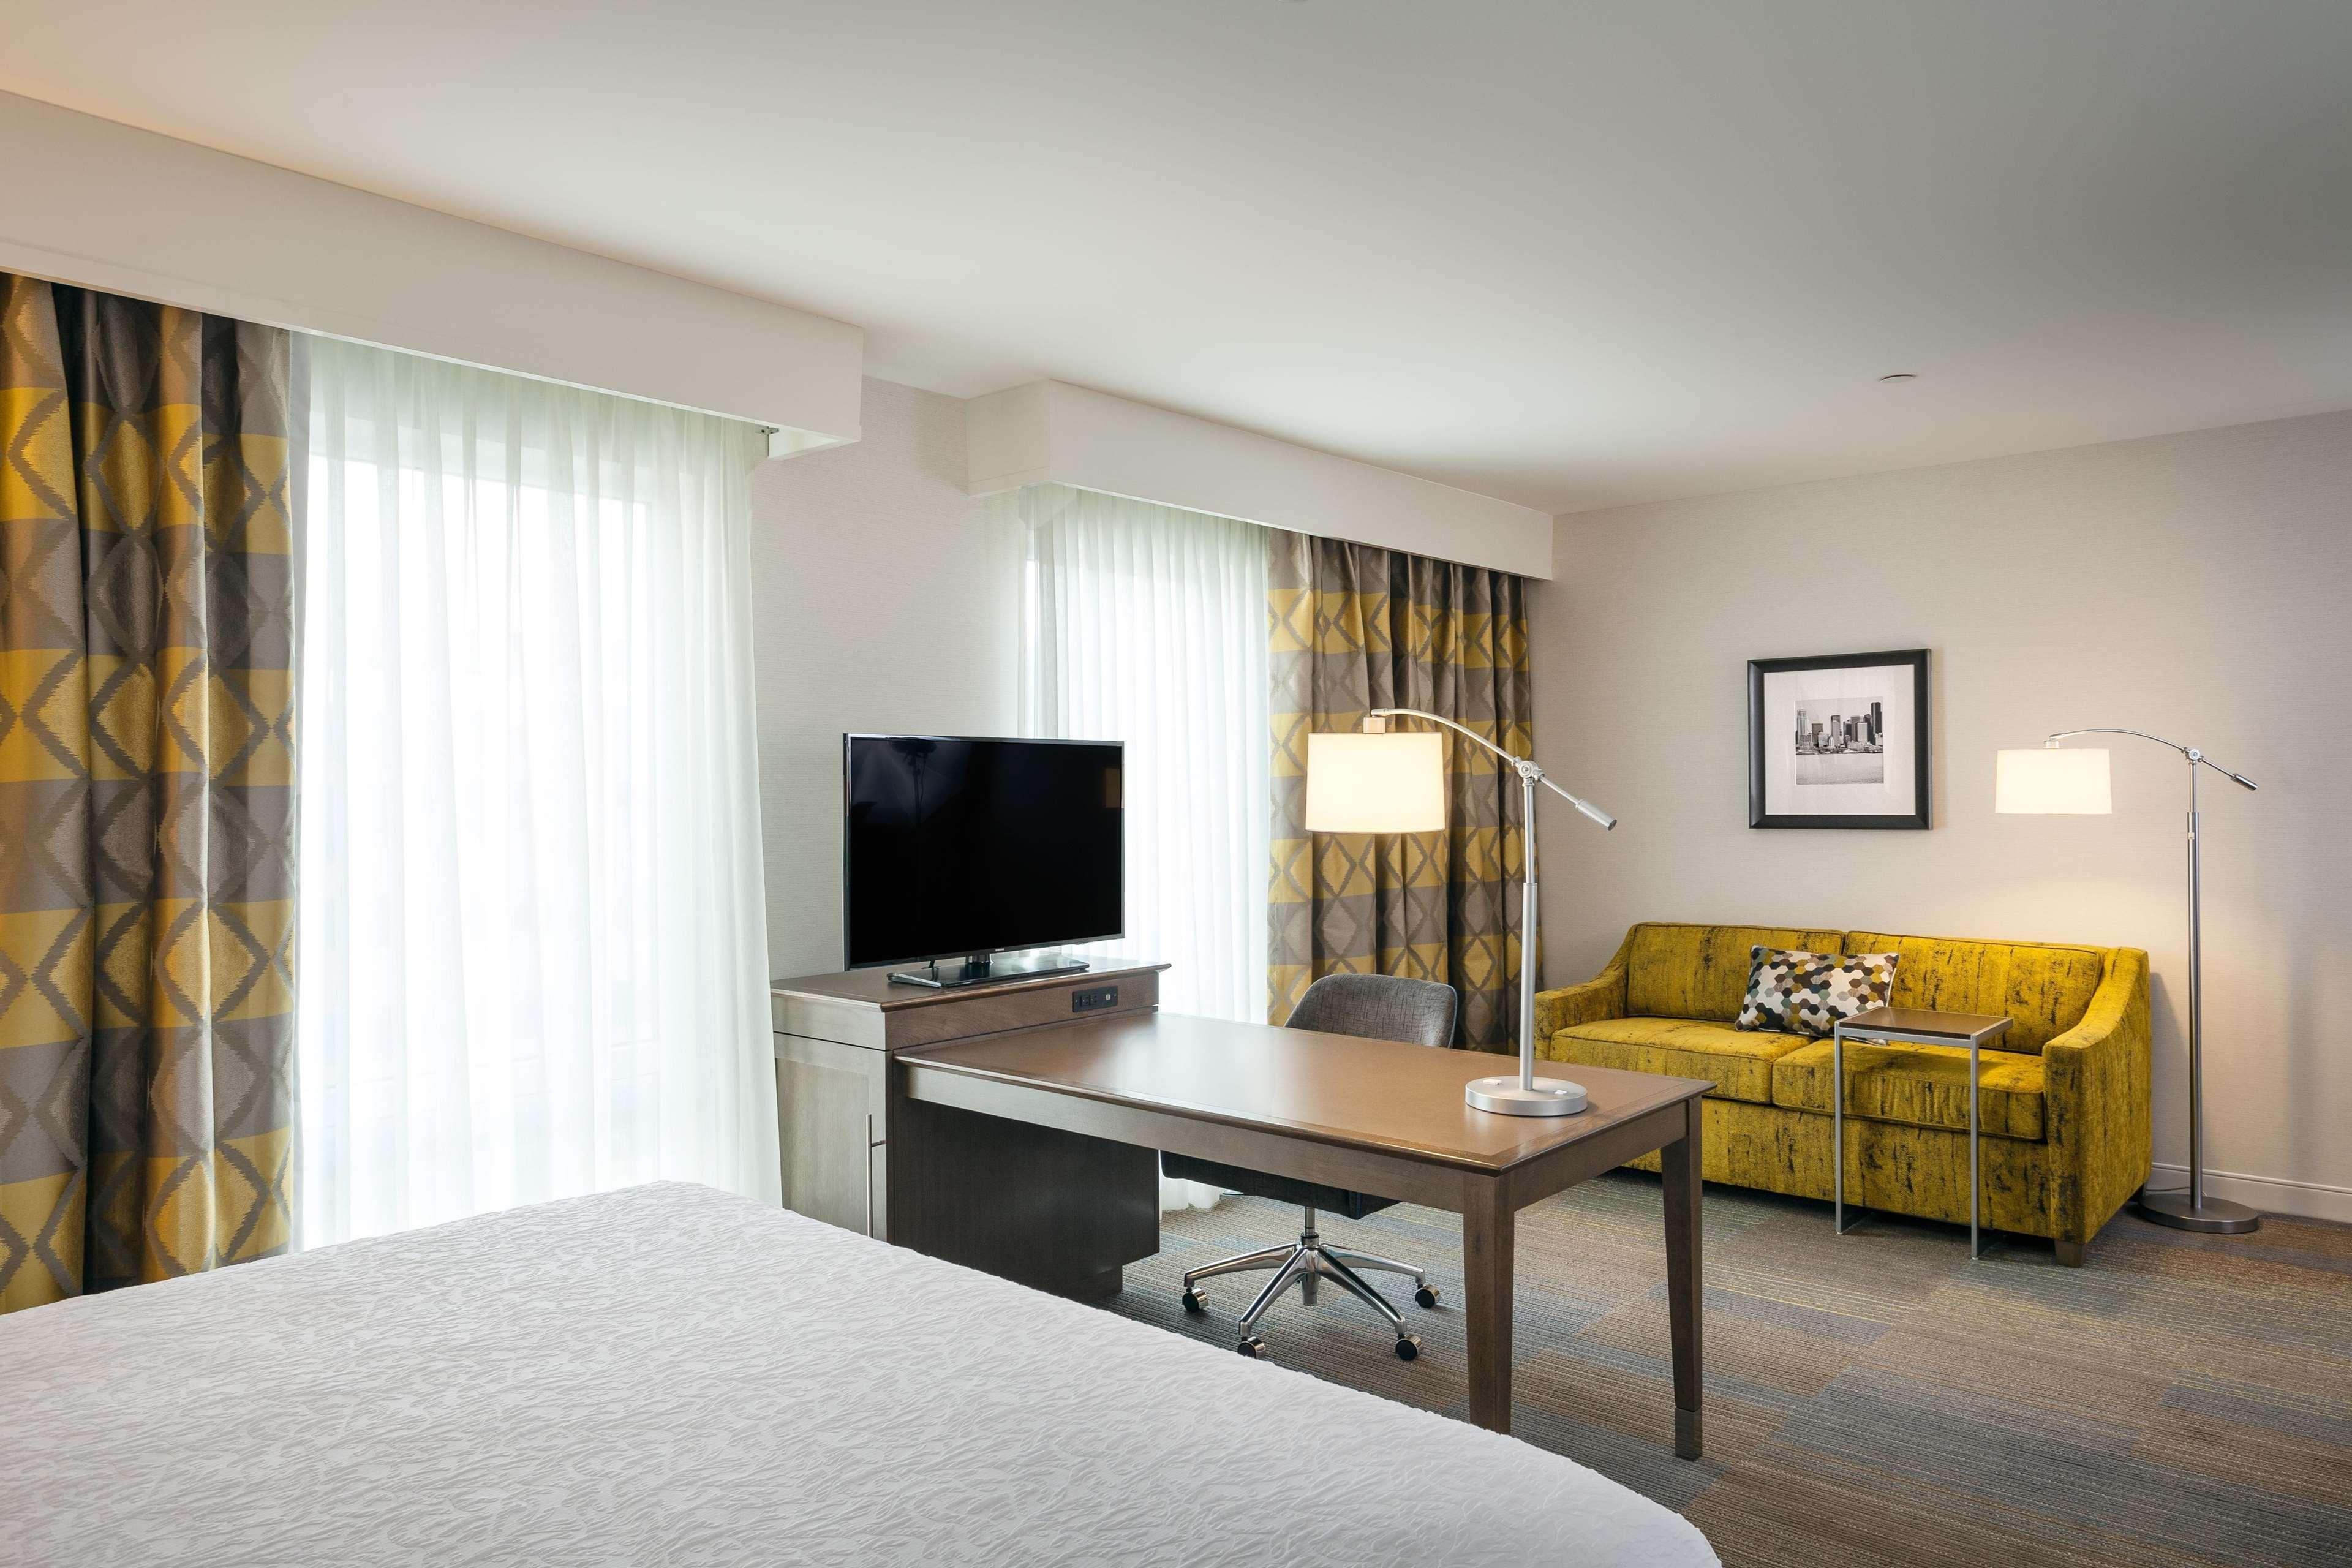 Hampton Inn & Suites by Hilton Seattle/Northgate image 32